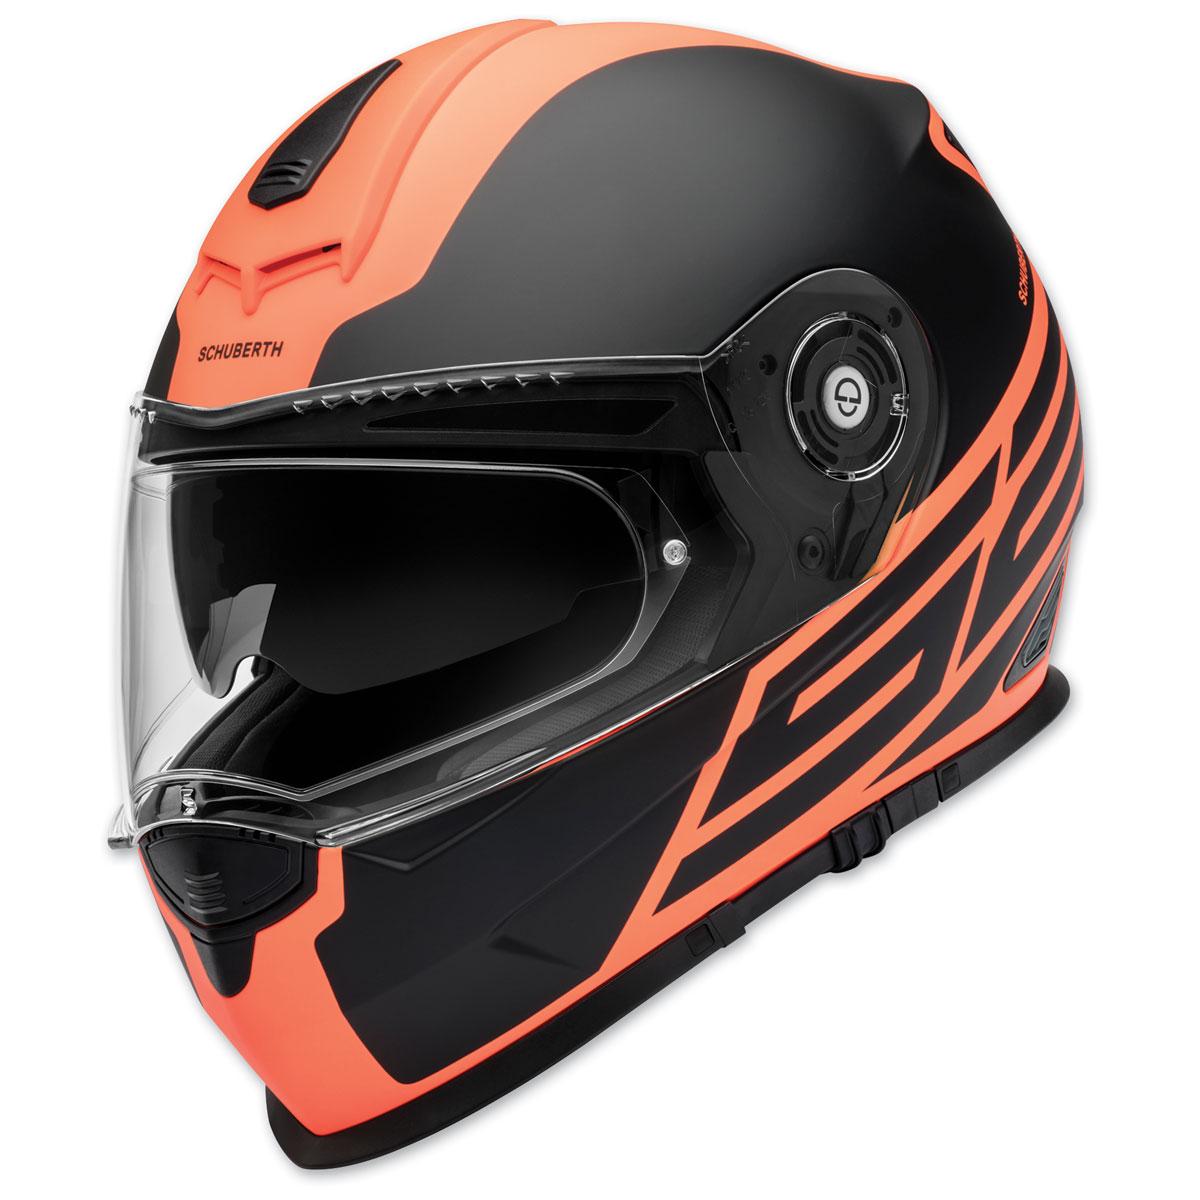 Schuberth S2 Review >> Schuberth S2 Sport Traction Orange Full Face Helmet 4429476360